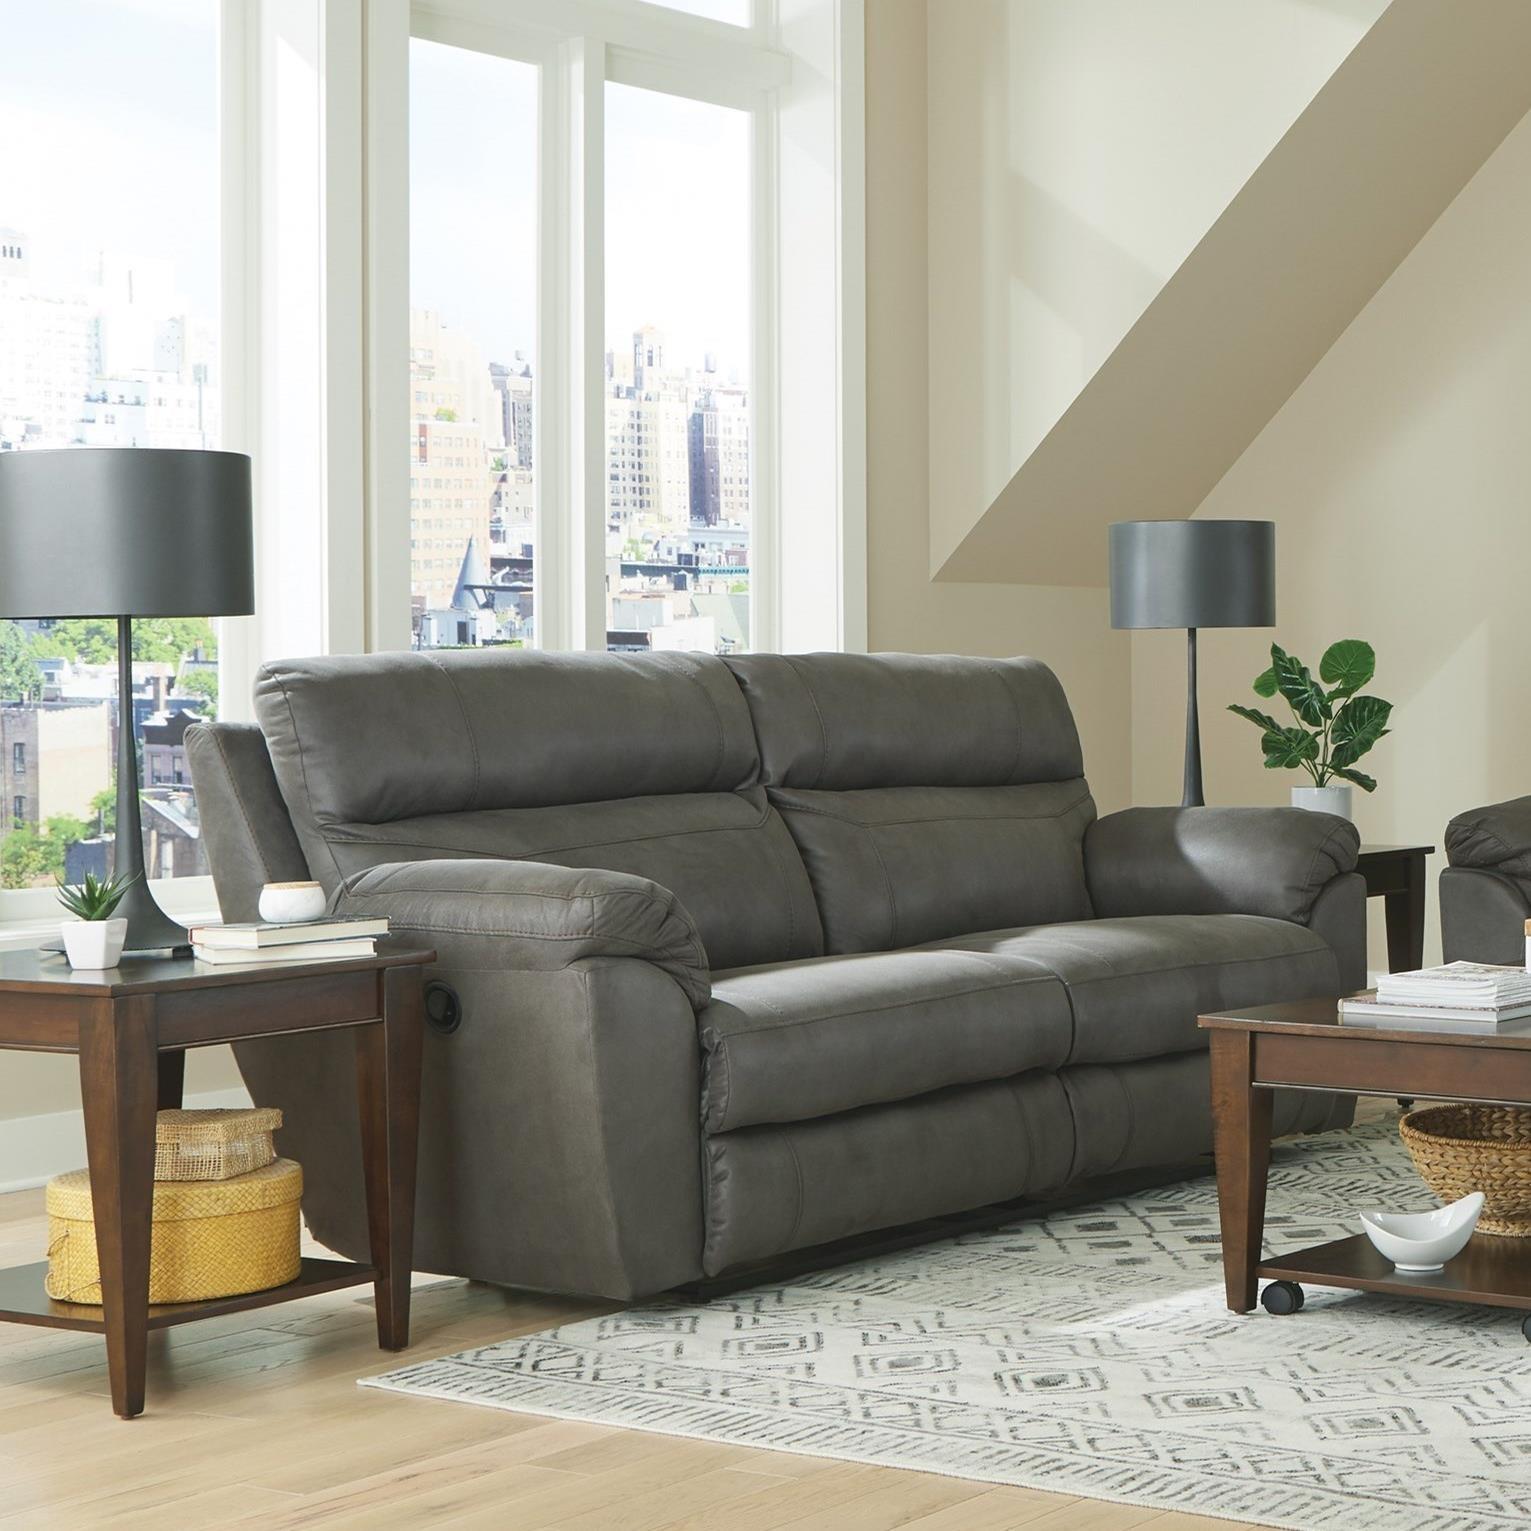 100 Atlas Reclining Sofa by Catnapper at Dream Home Interiors